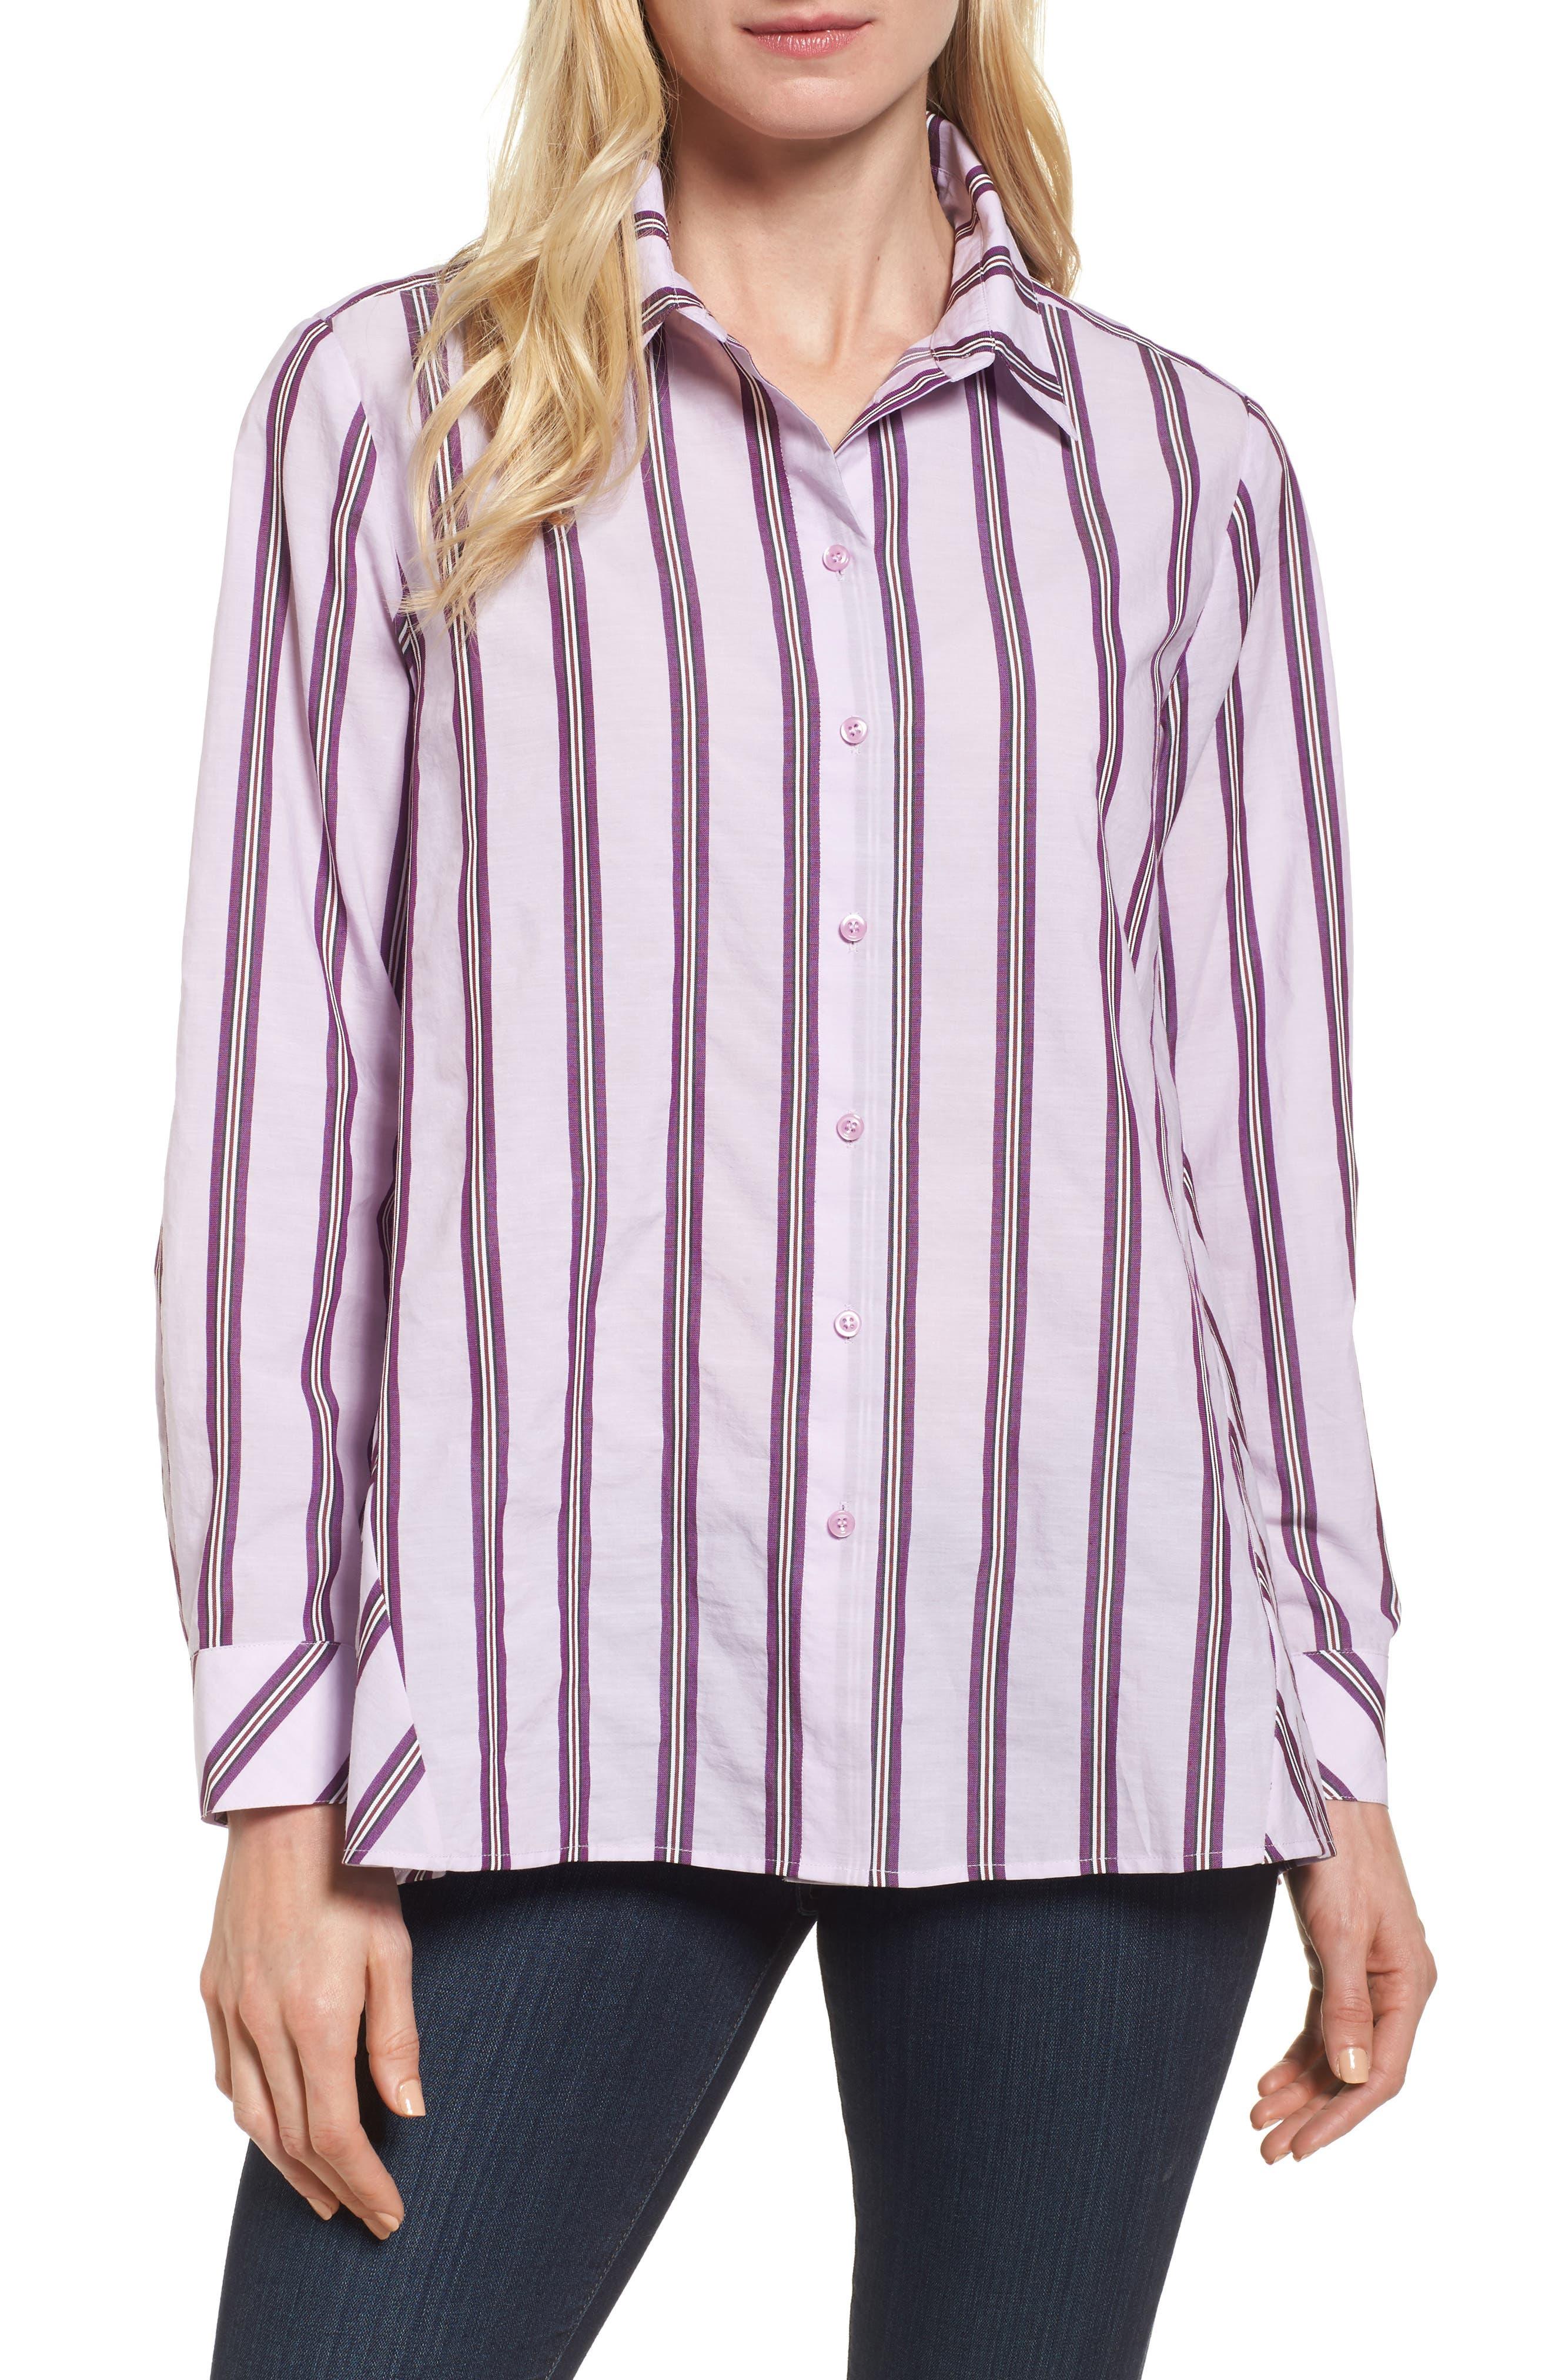 Nordstrom Signature Oversize Stripe Shirt